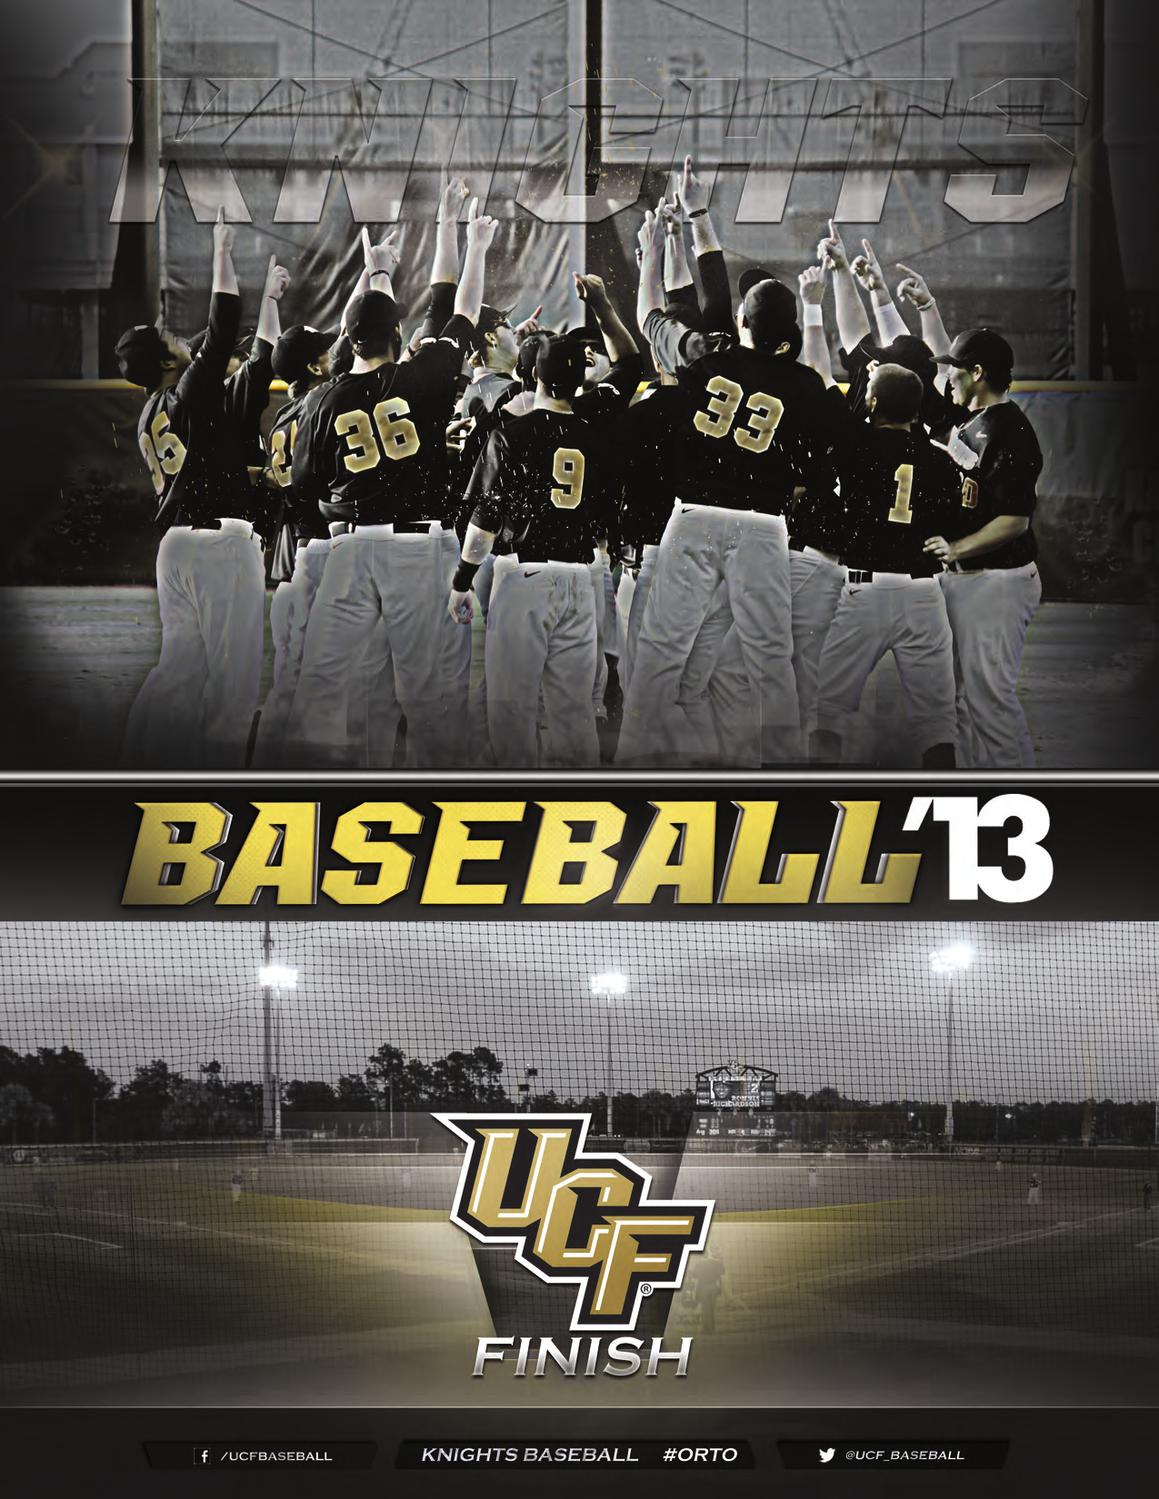 ucf knights baseball logo - photo #27